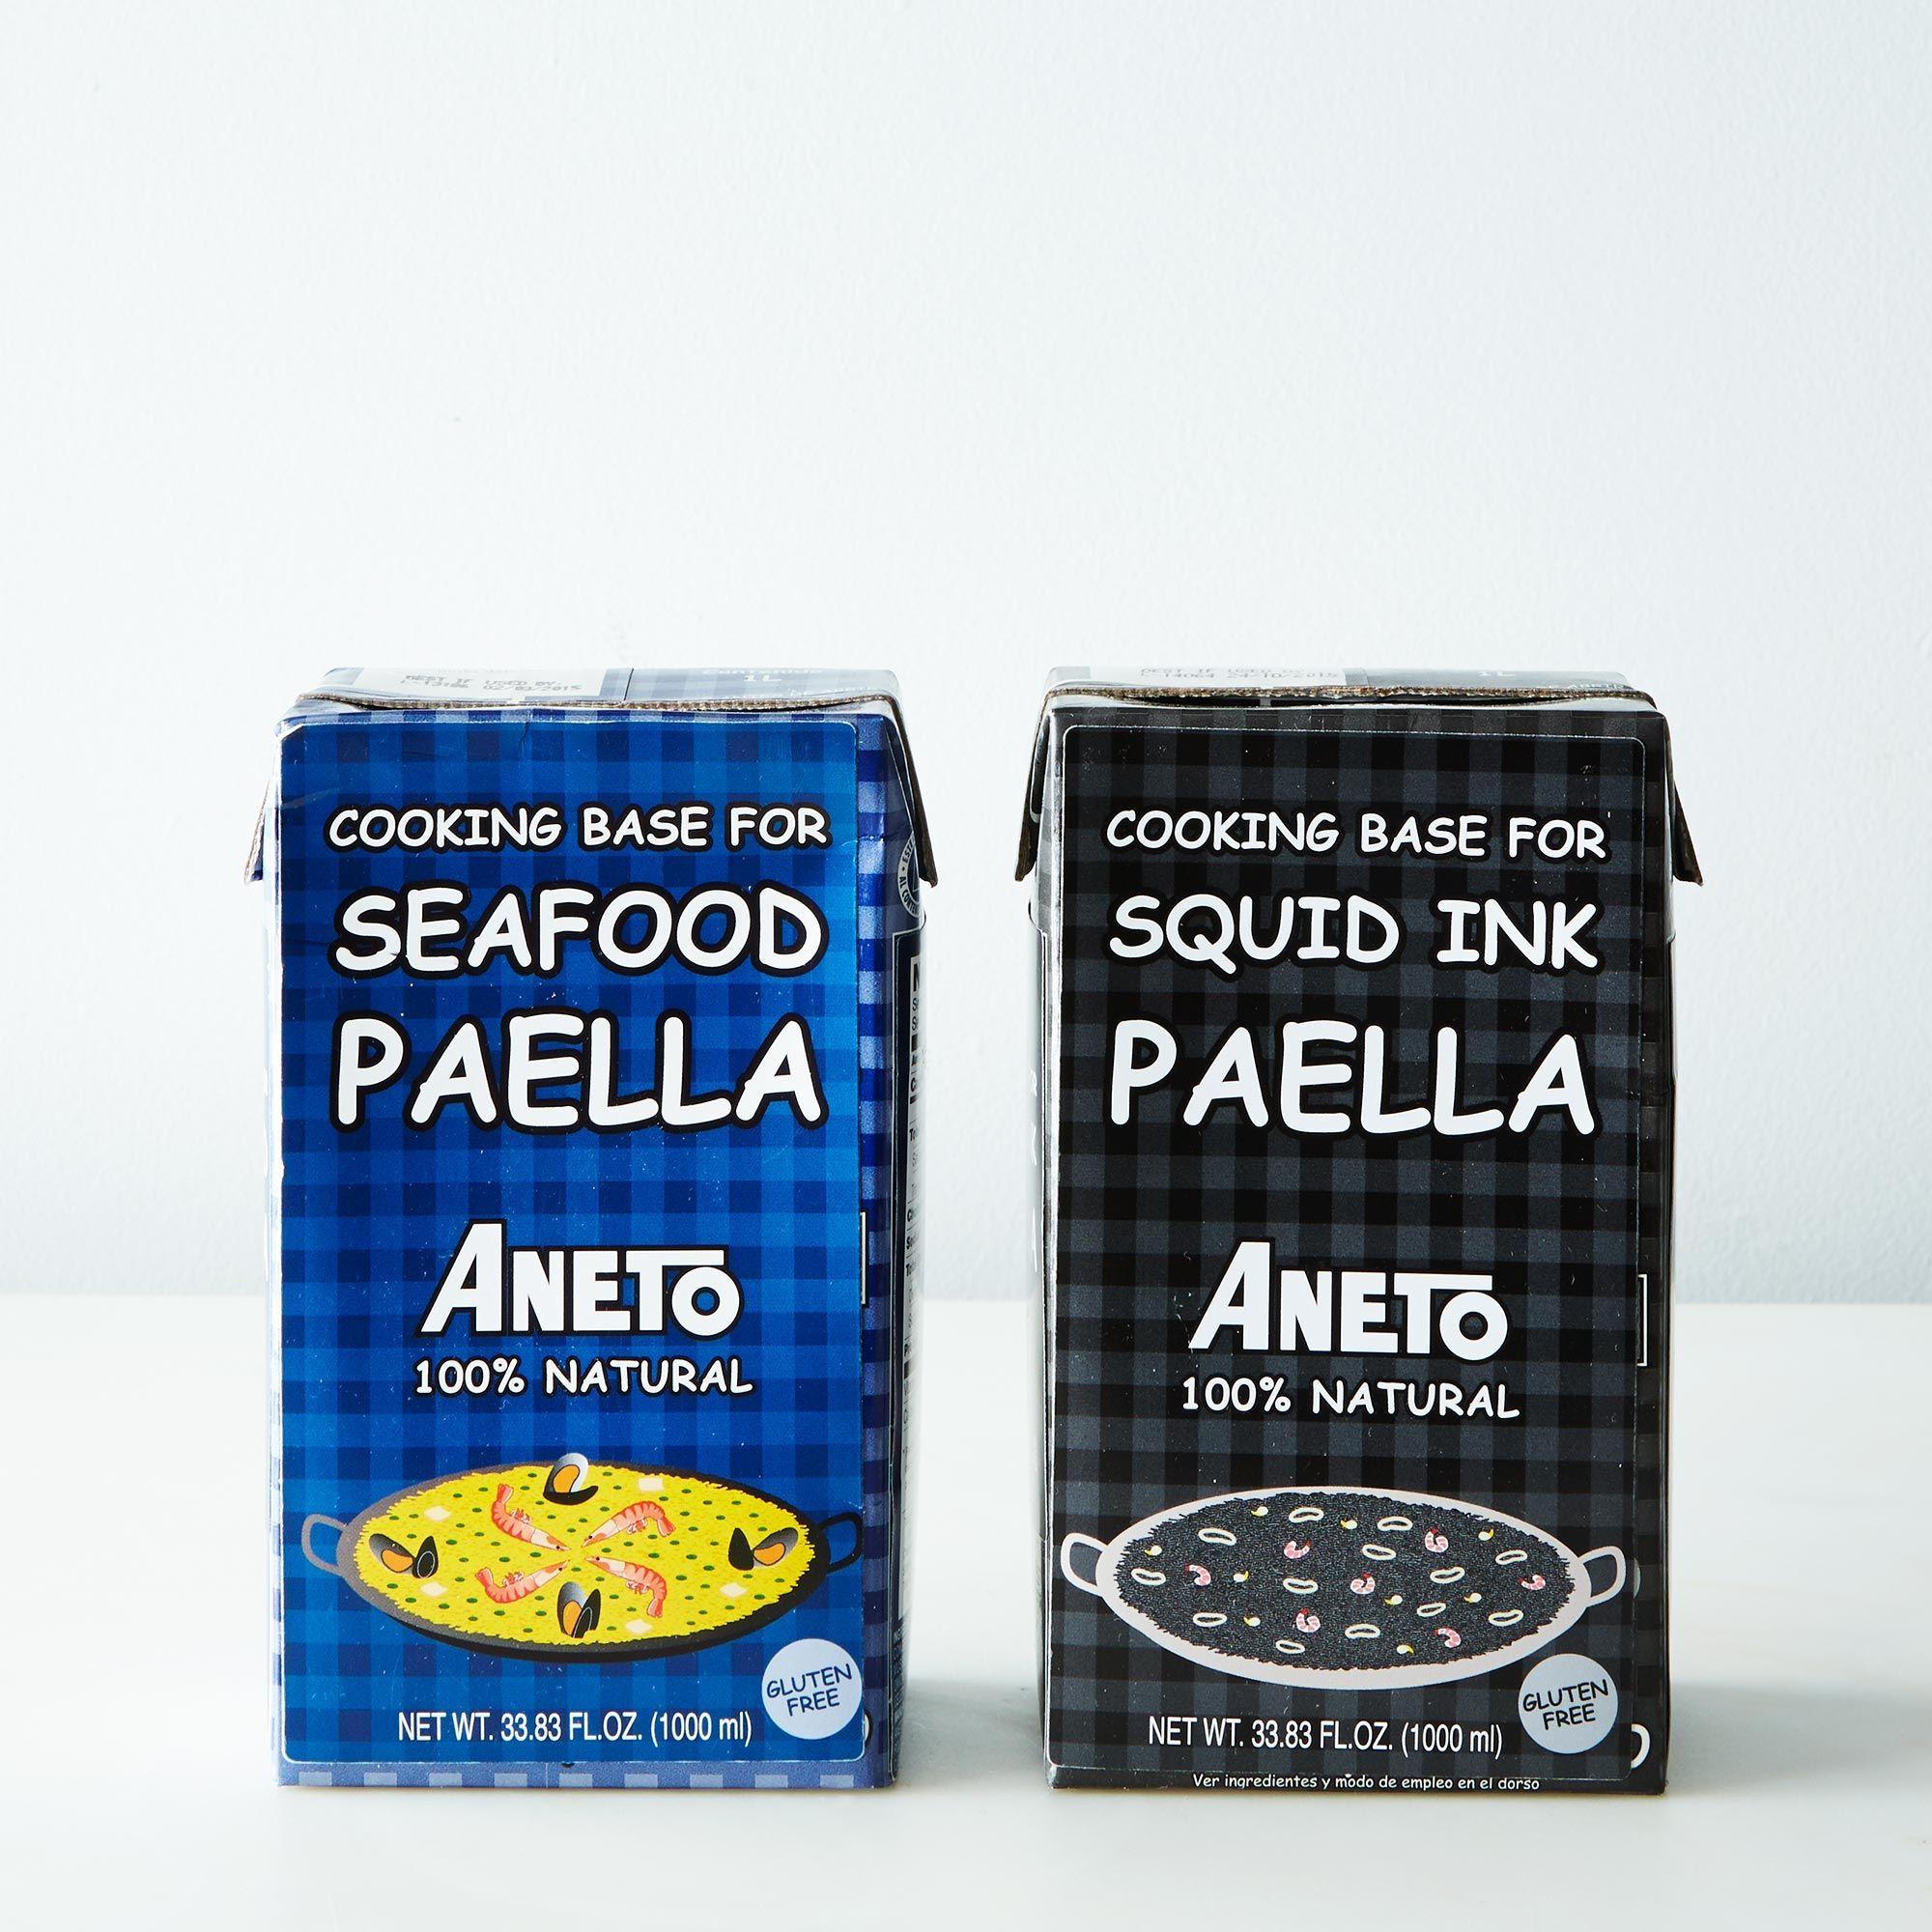 7154fccf 8727 44d7 9021 c5af31c9a2d0  2014 0724 raposos seafood squid ink paella duo 002